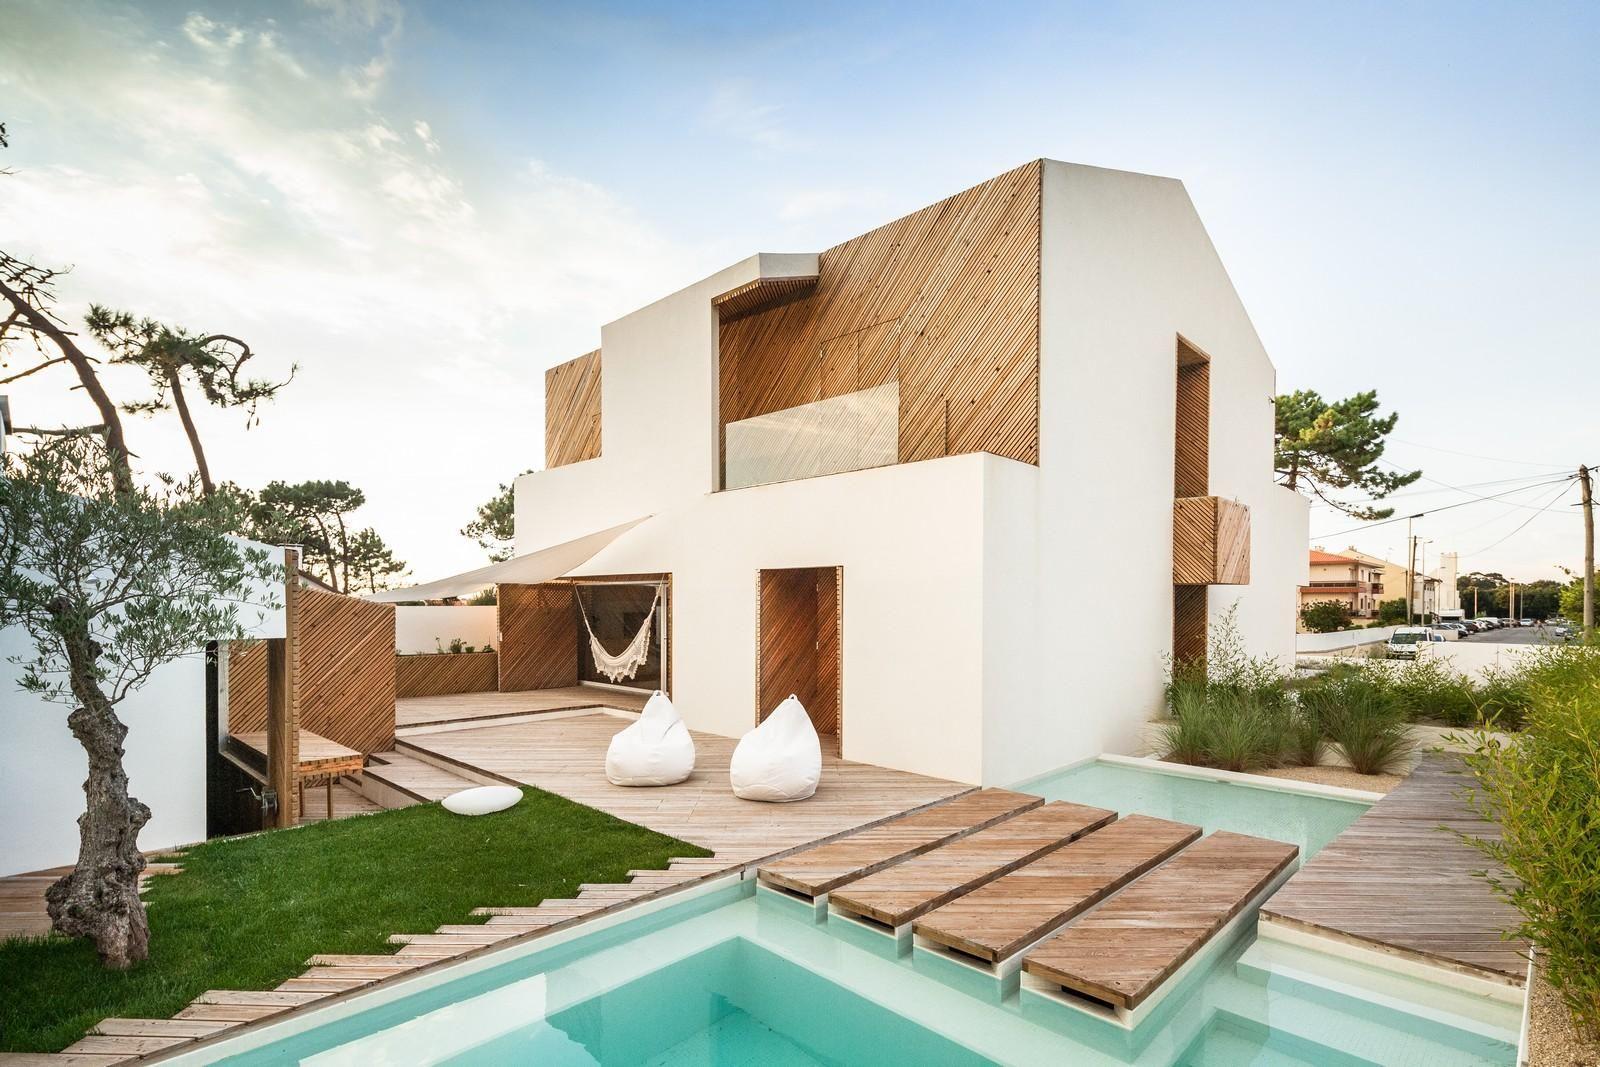 SILVER WOOD HOUSE BY ERNESTO PEREIRA by Joao Morgado - Architectural Photography